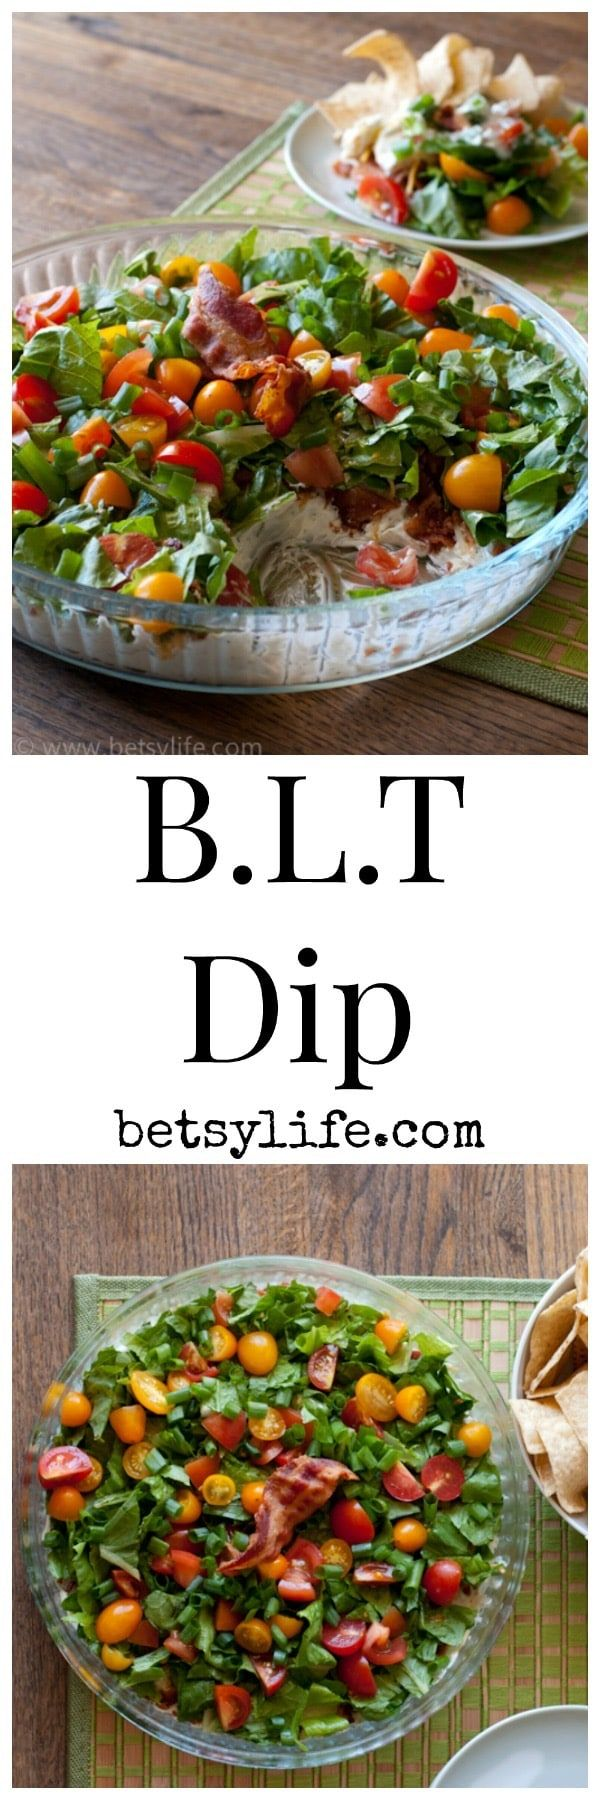 Bacon, lettuce and tomato in a super simple dip recipe!